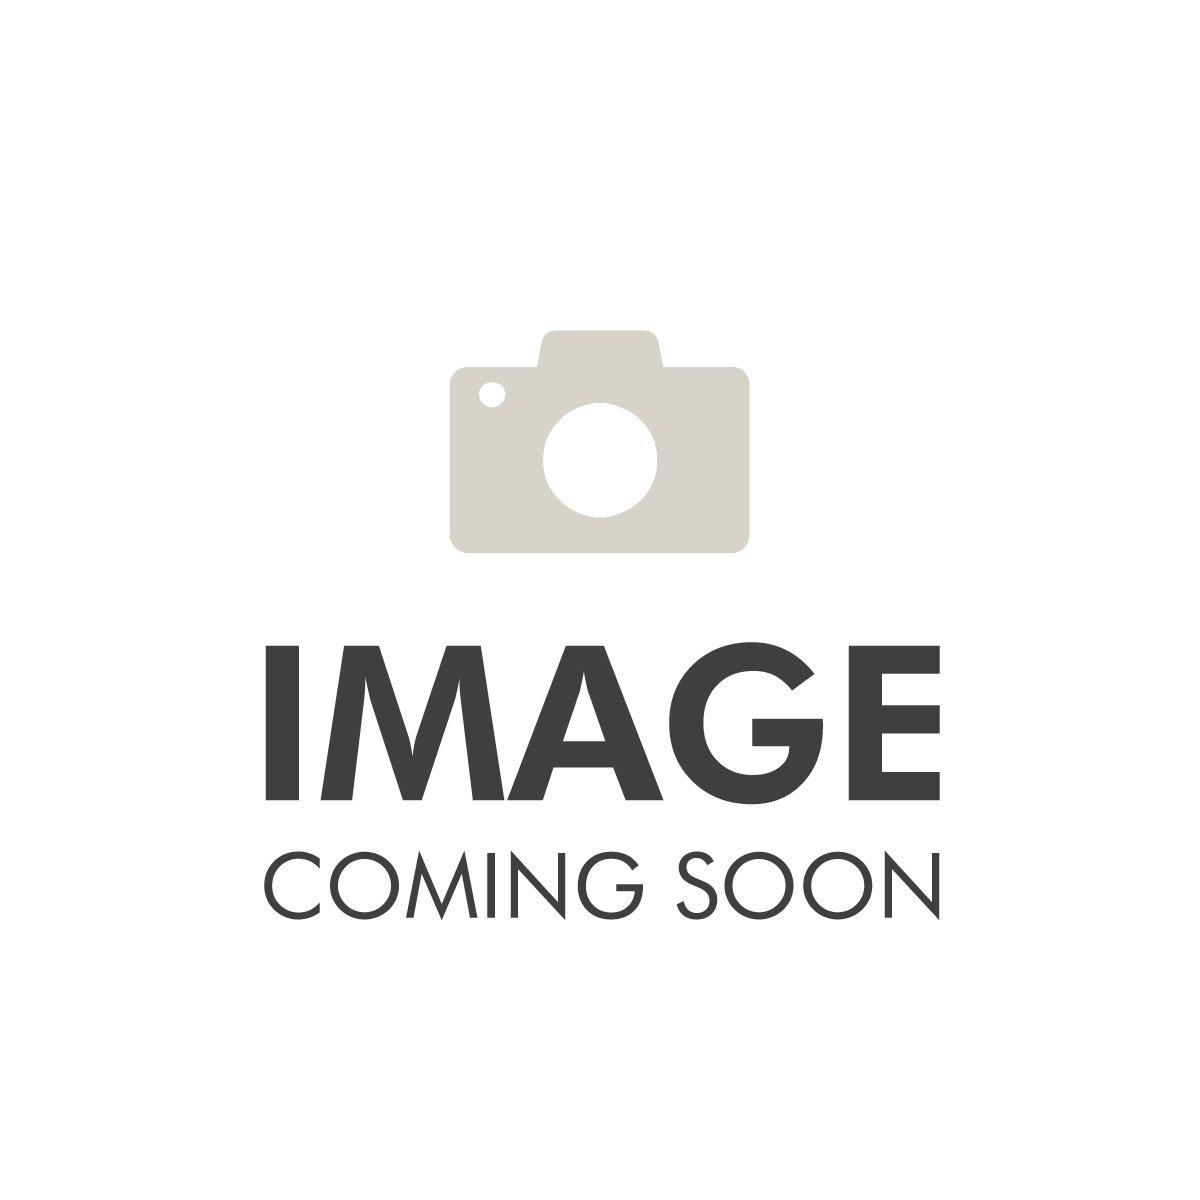 L'Oreal Loreal Permanent Hair Color Prodigy 4 Sepia